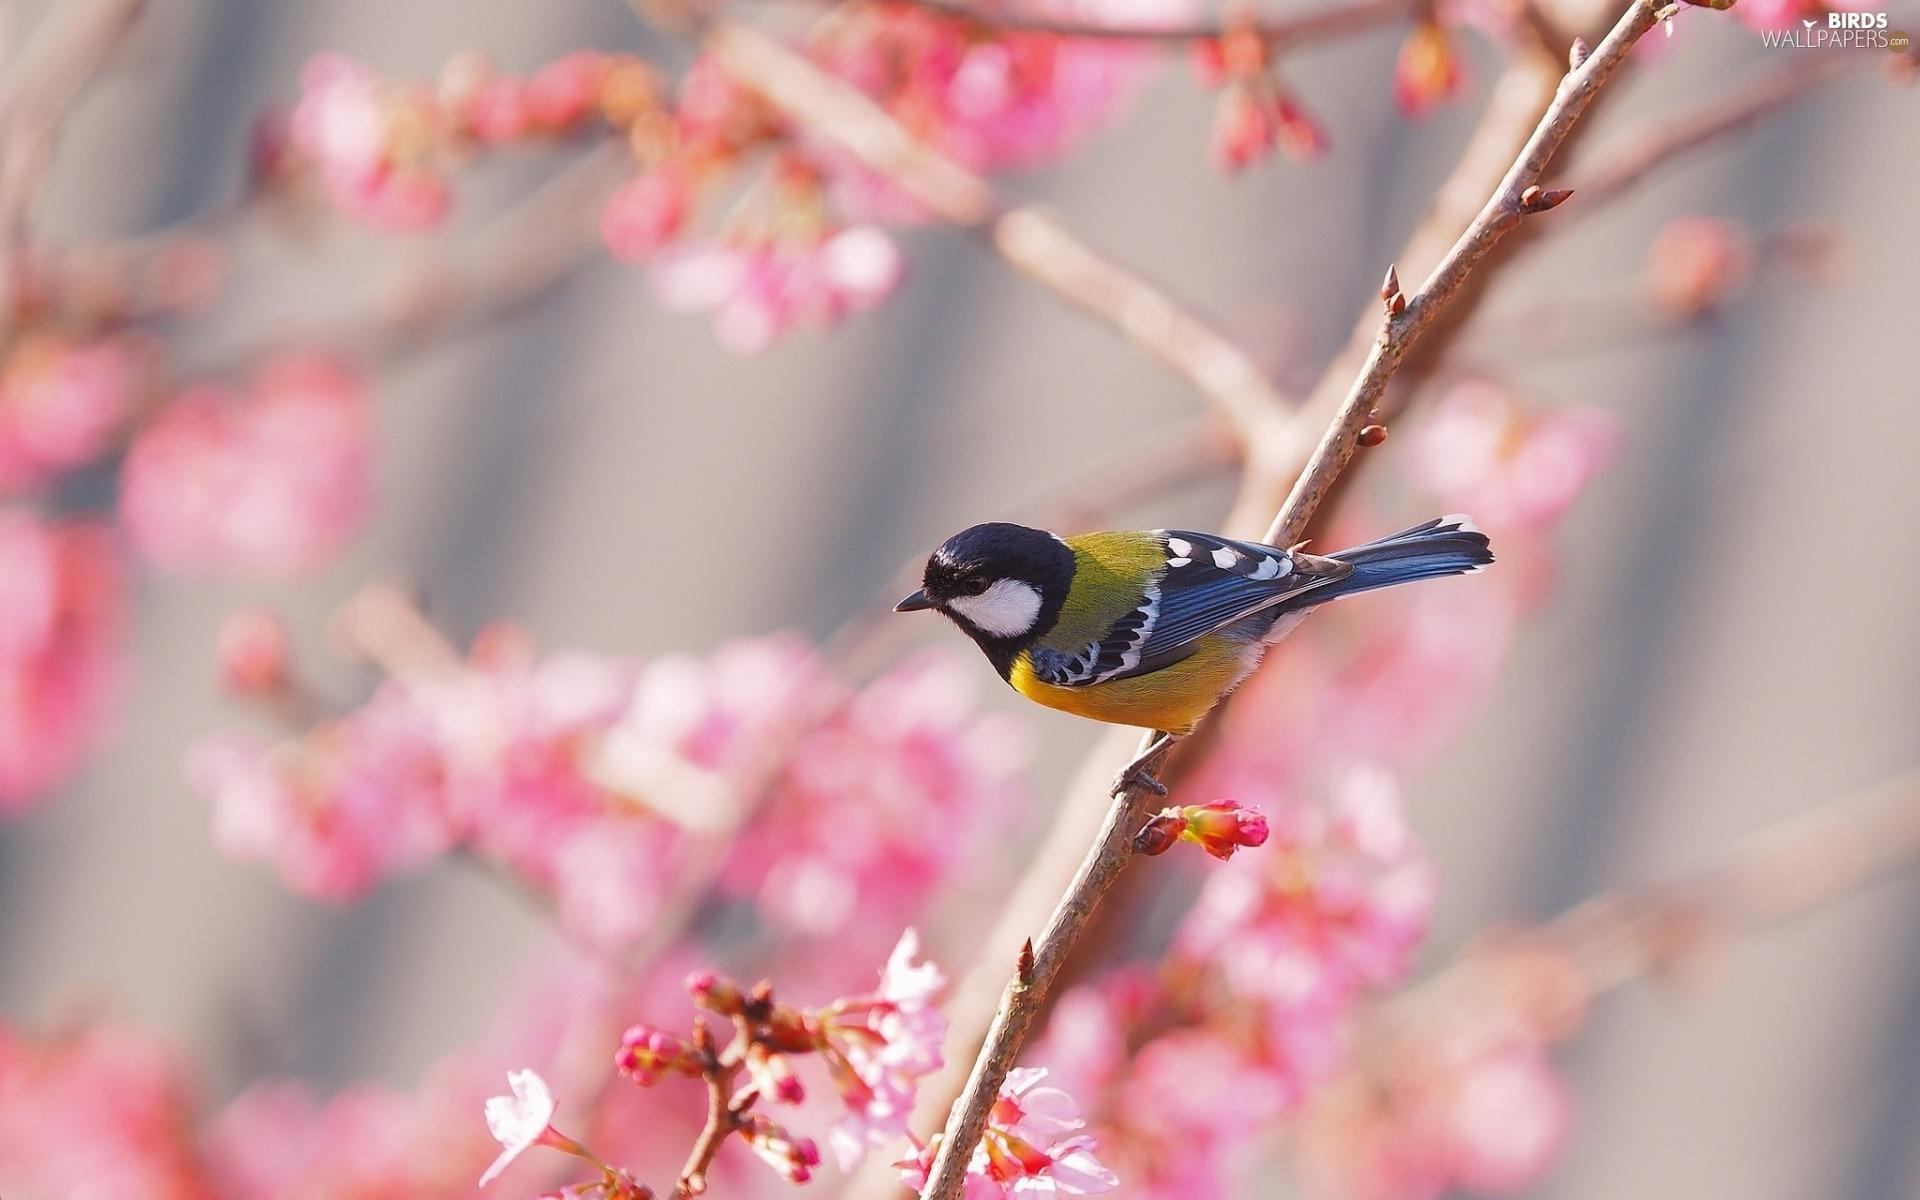 spring tit branch birds wallpapers 1920x1200